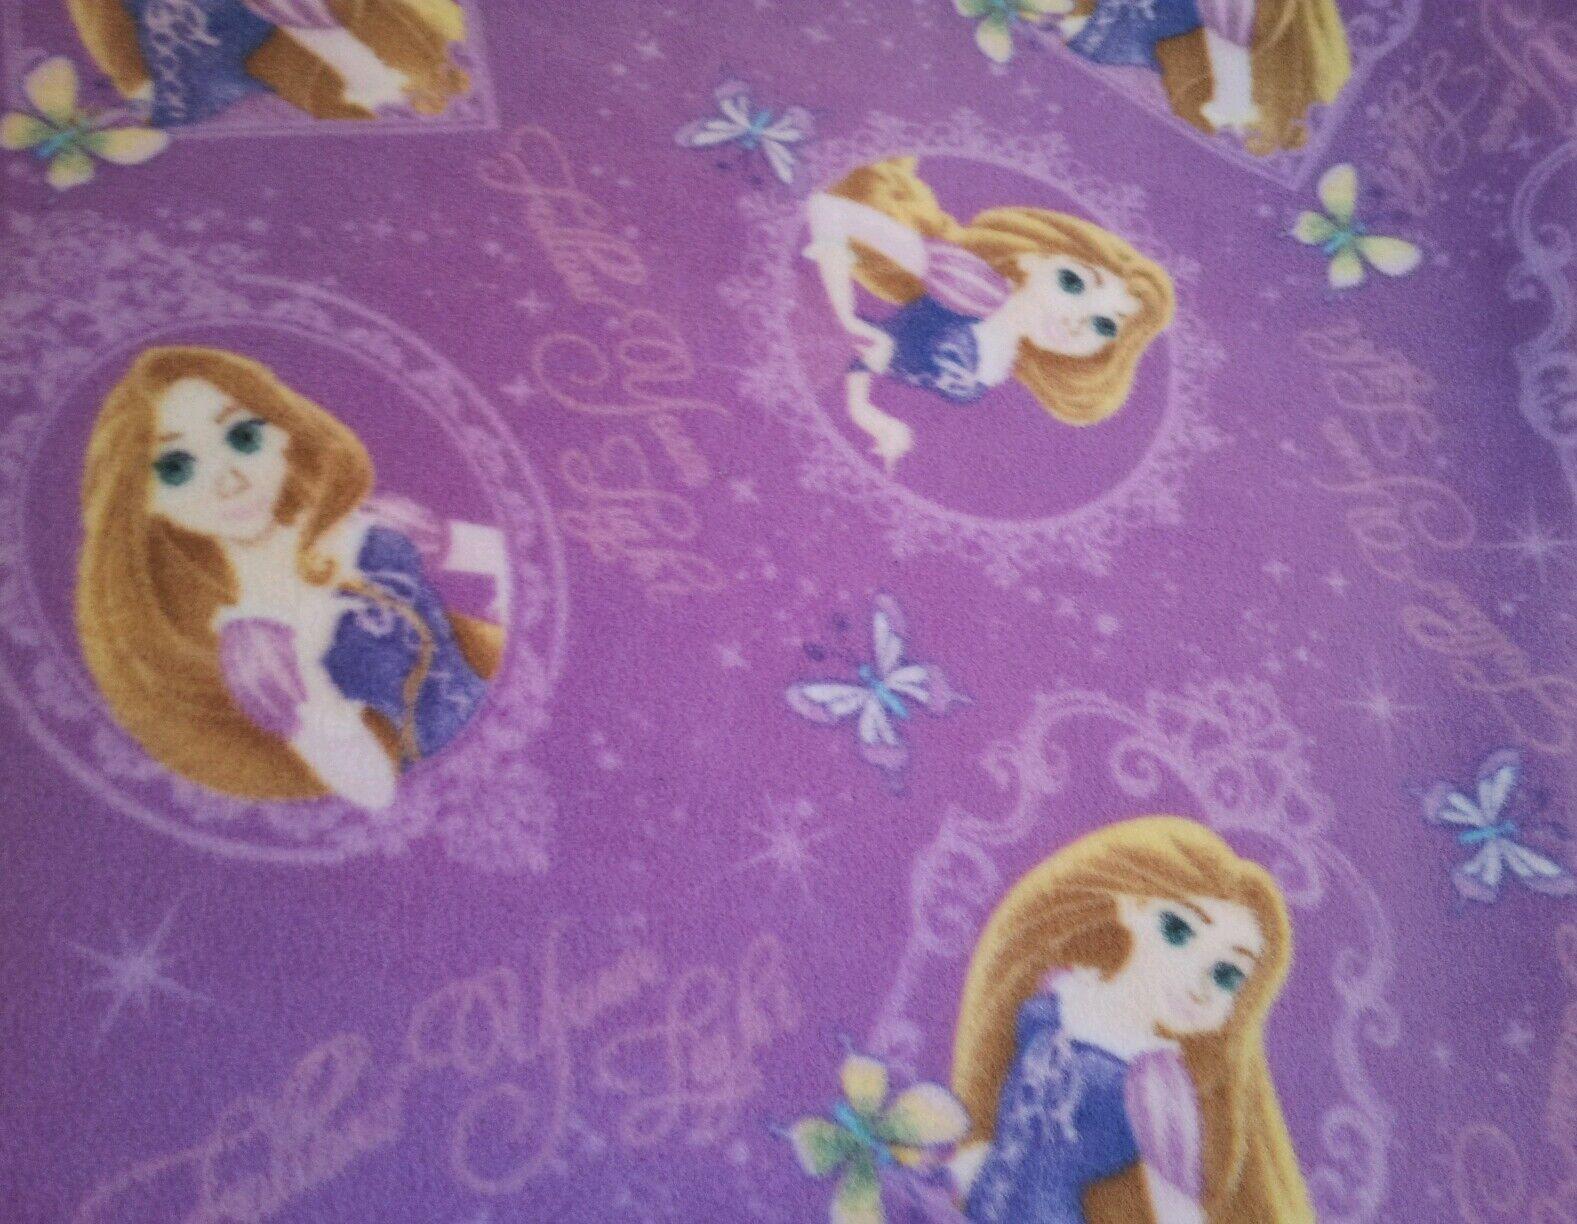 Disney Rapunzel Holding Hair Tangled Princess Fleece Throw Blanket NEW